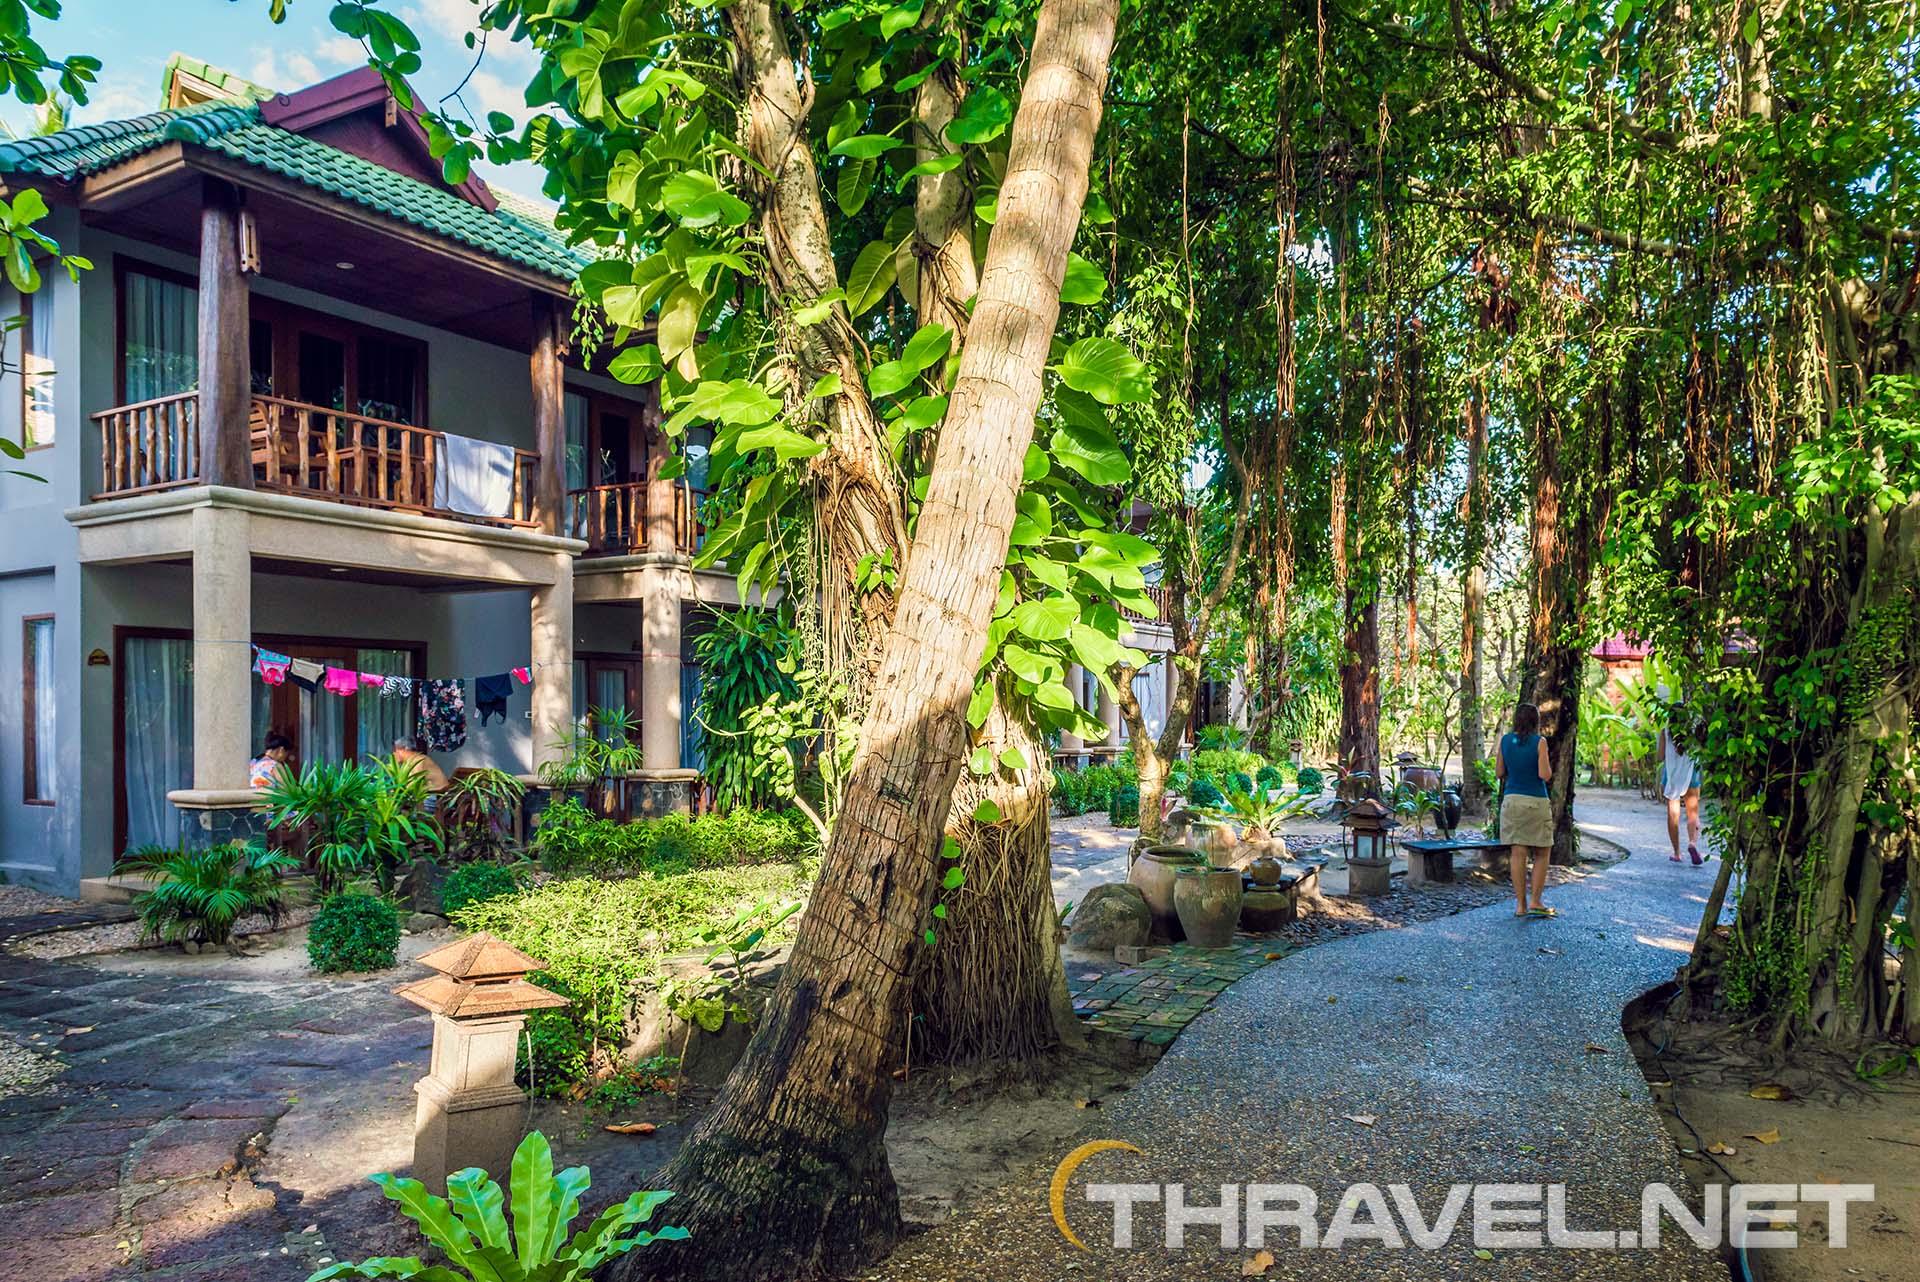 Railey-beach-hotels-garden-view